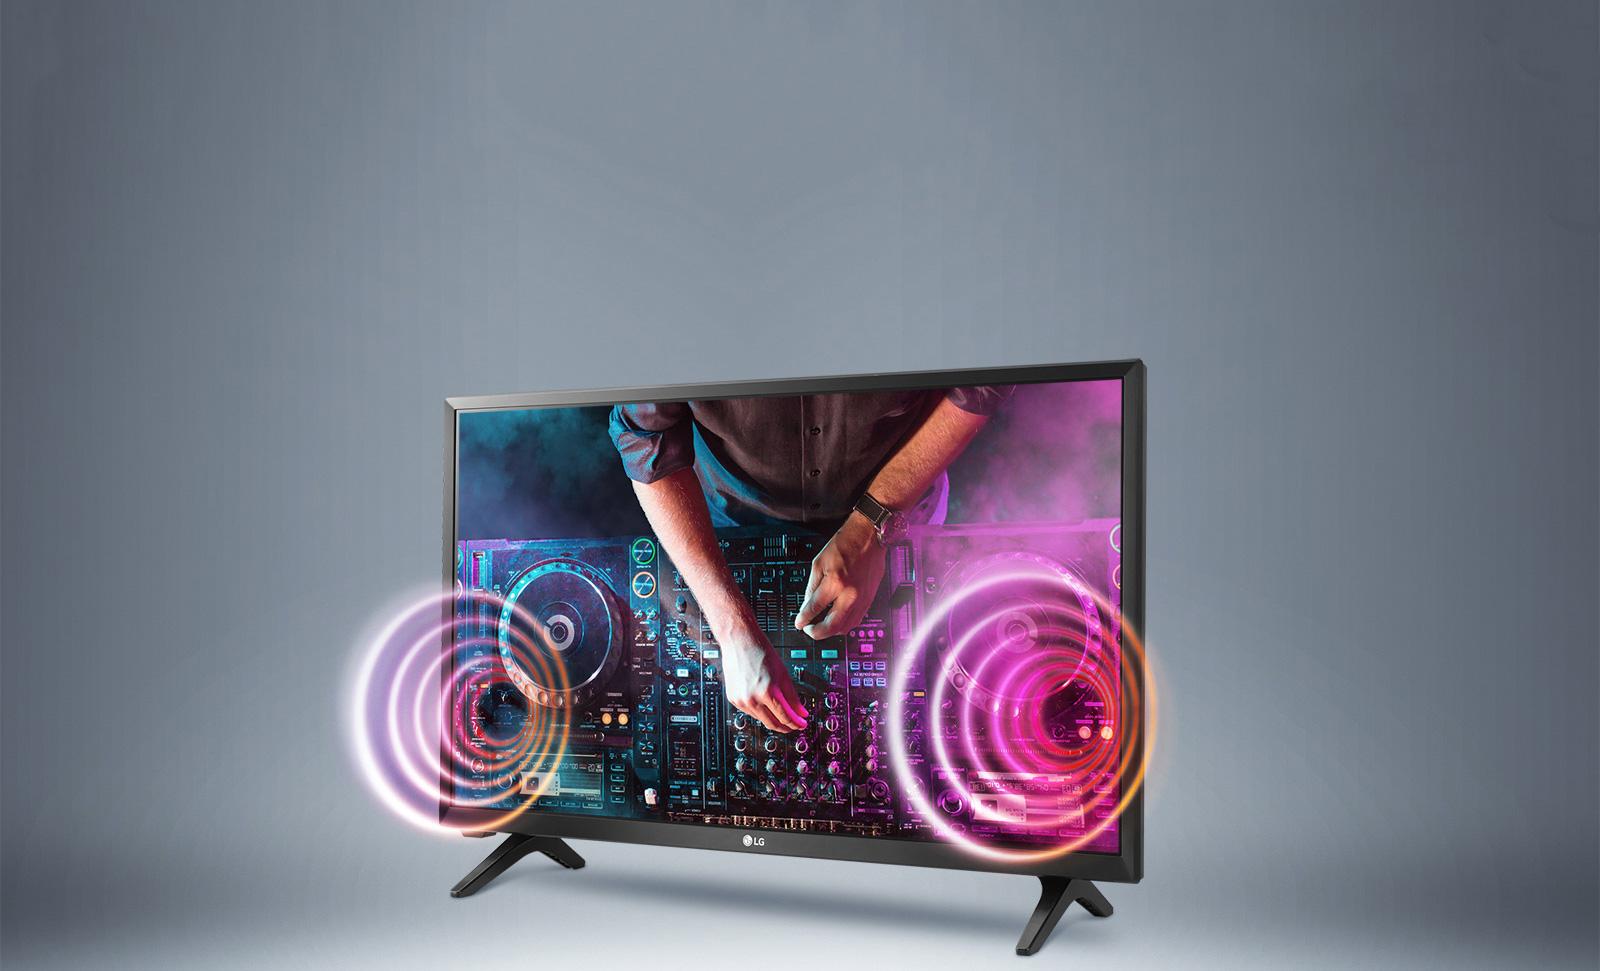 t l vision lg 28mt42vf pas cher achat vente lg 28mt42vf en promo. Black Bedroom Furniture Sets. Home Design Ideas